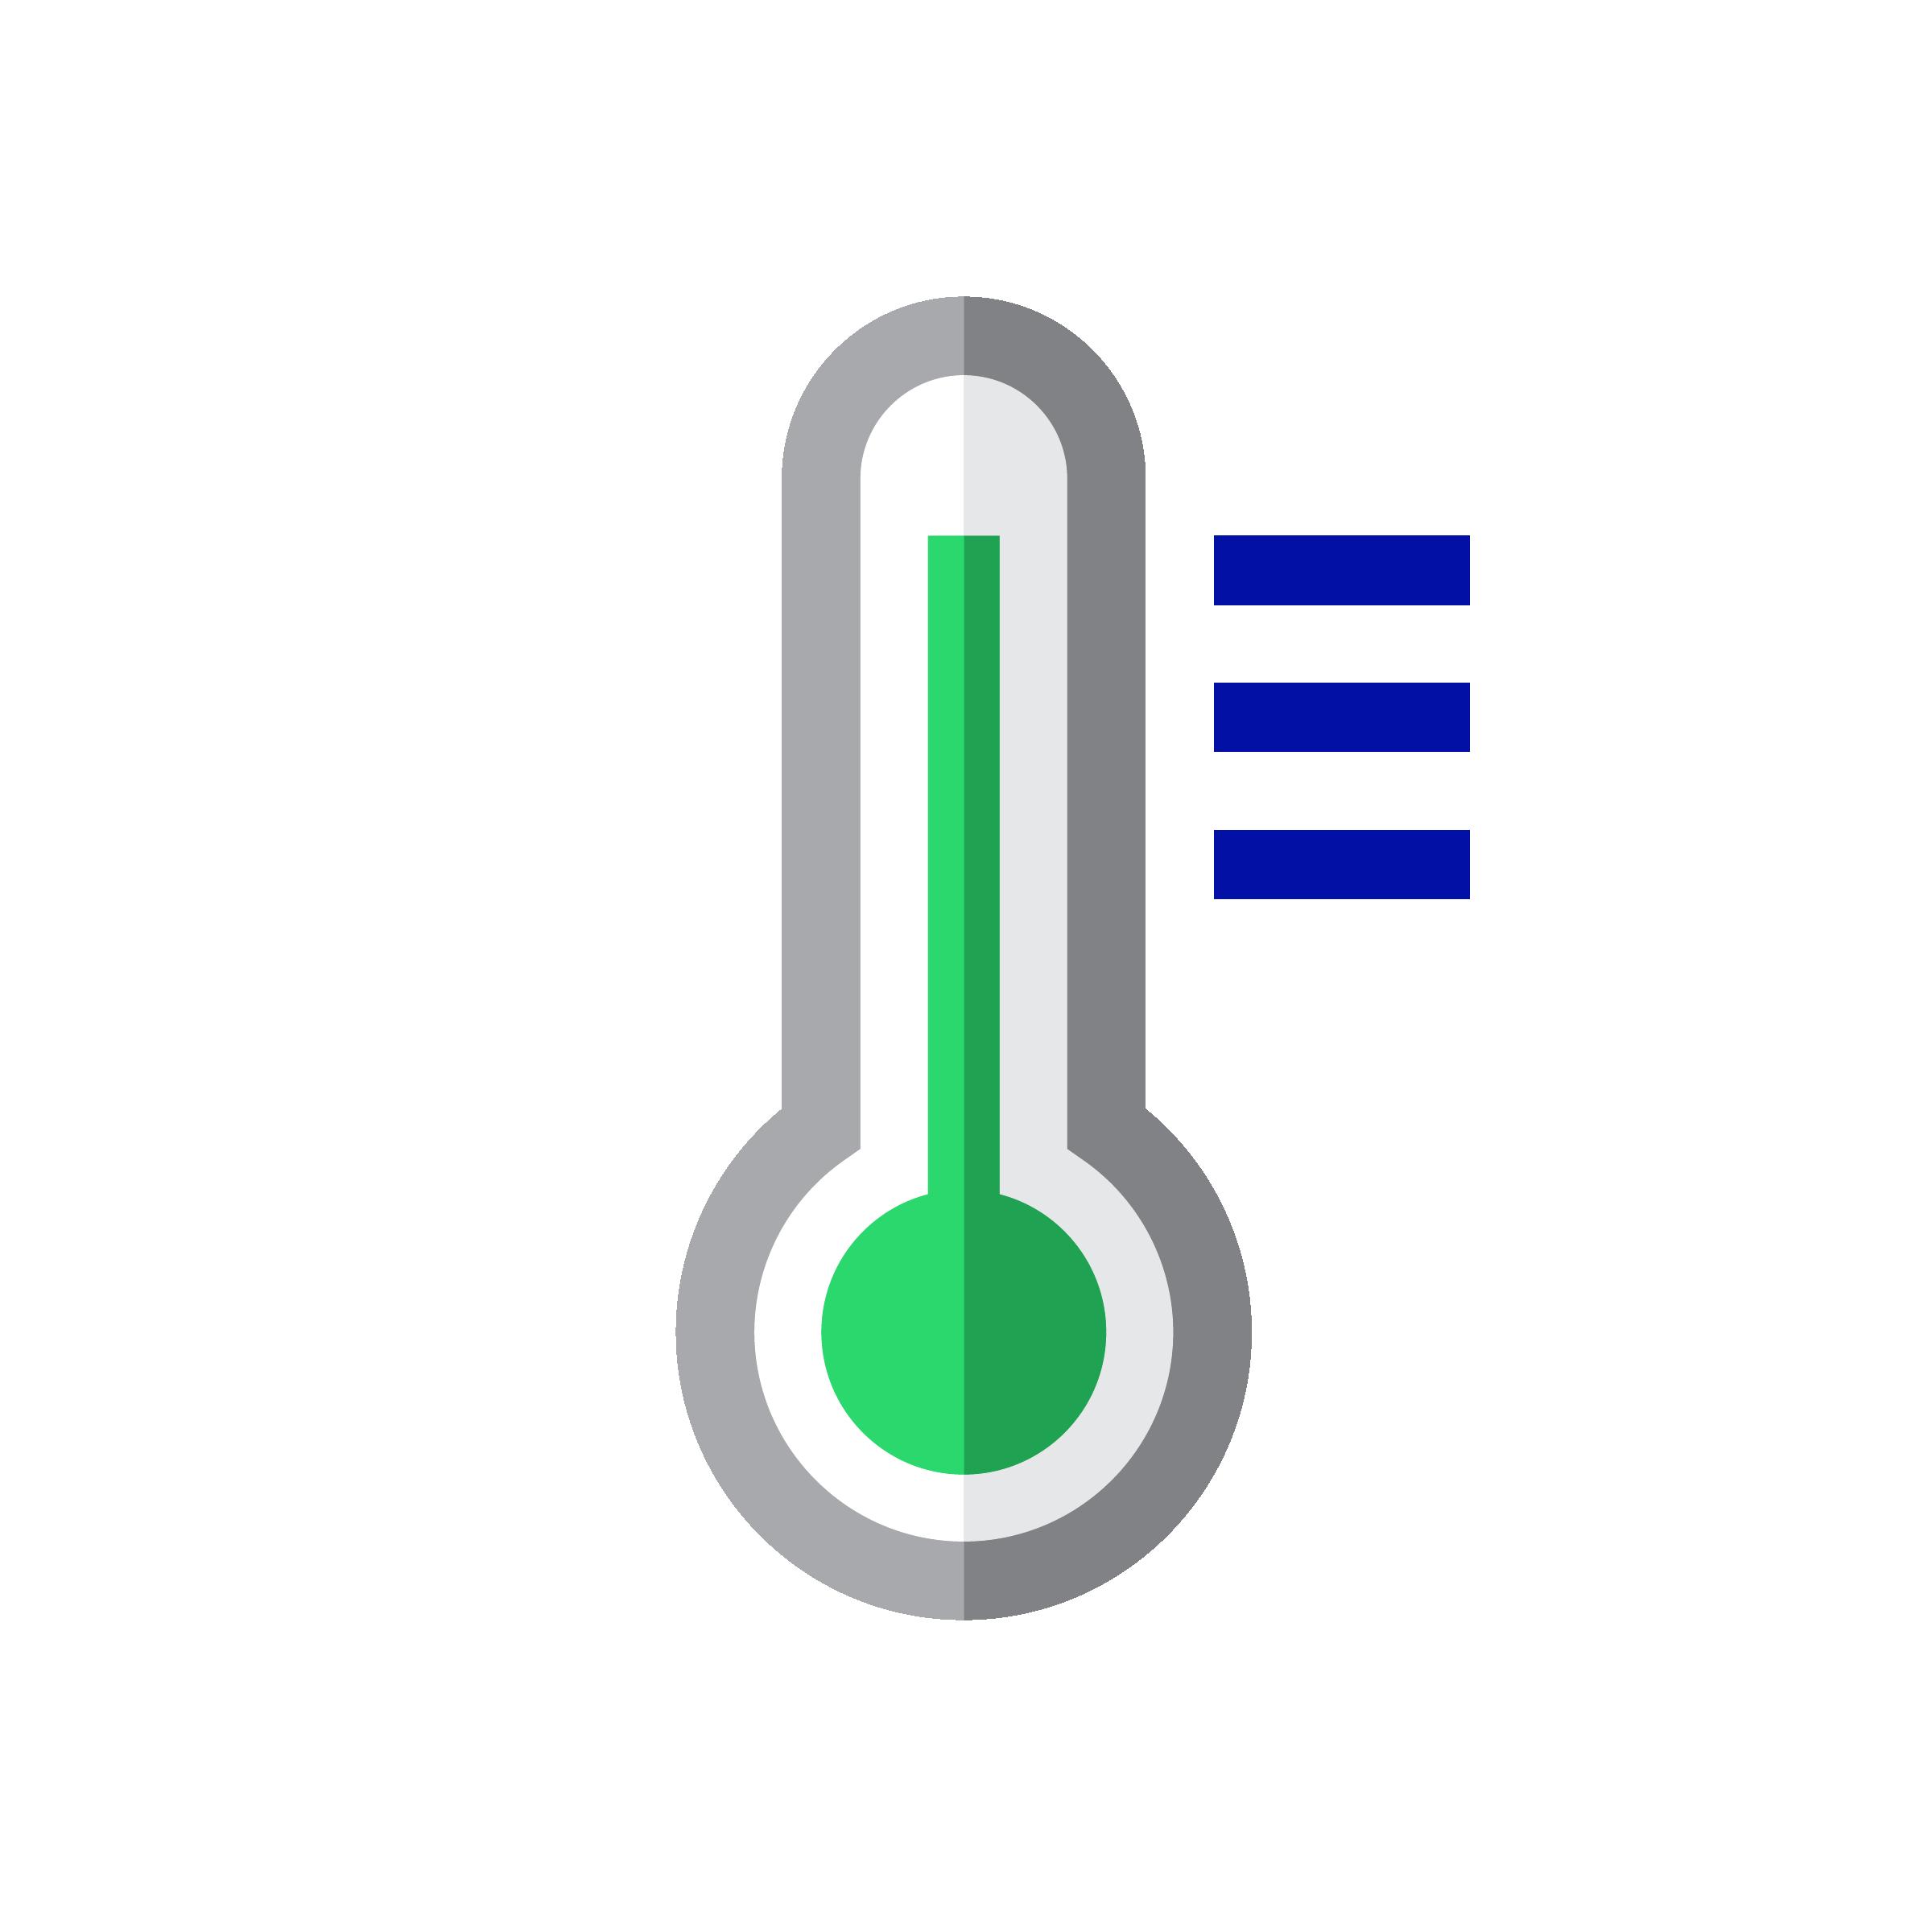 Program_need_icon_warm.png